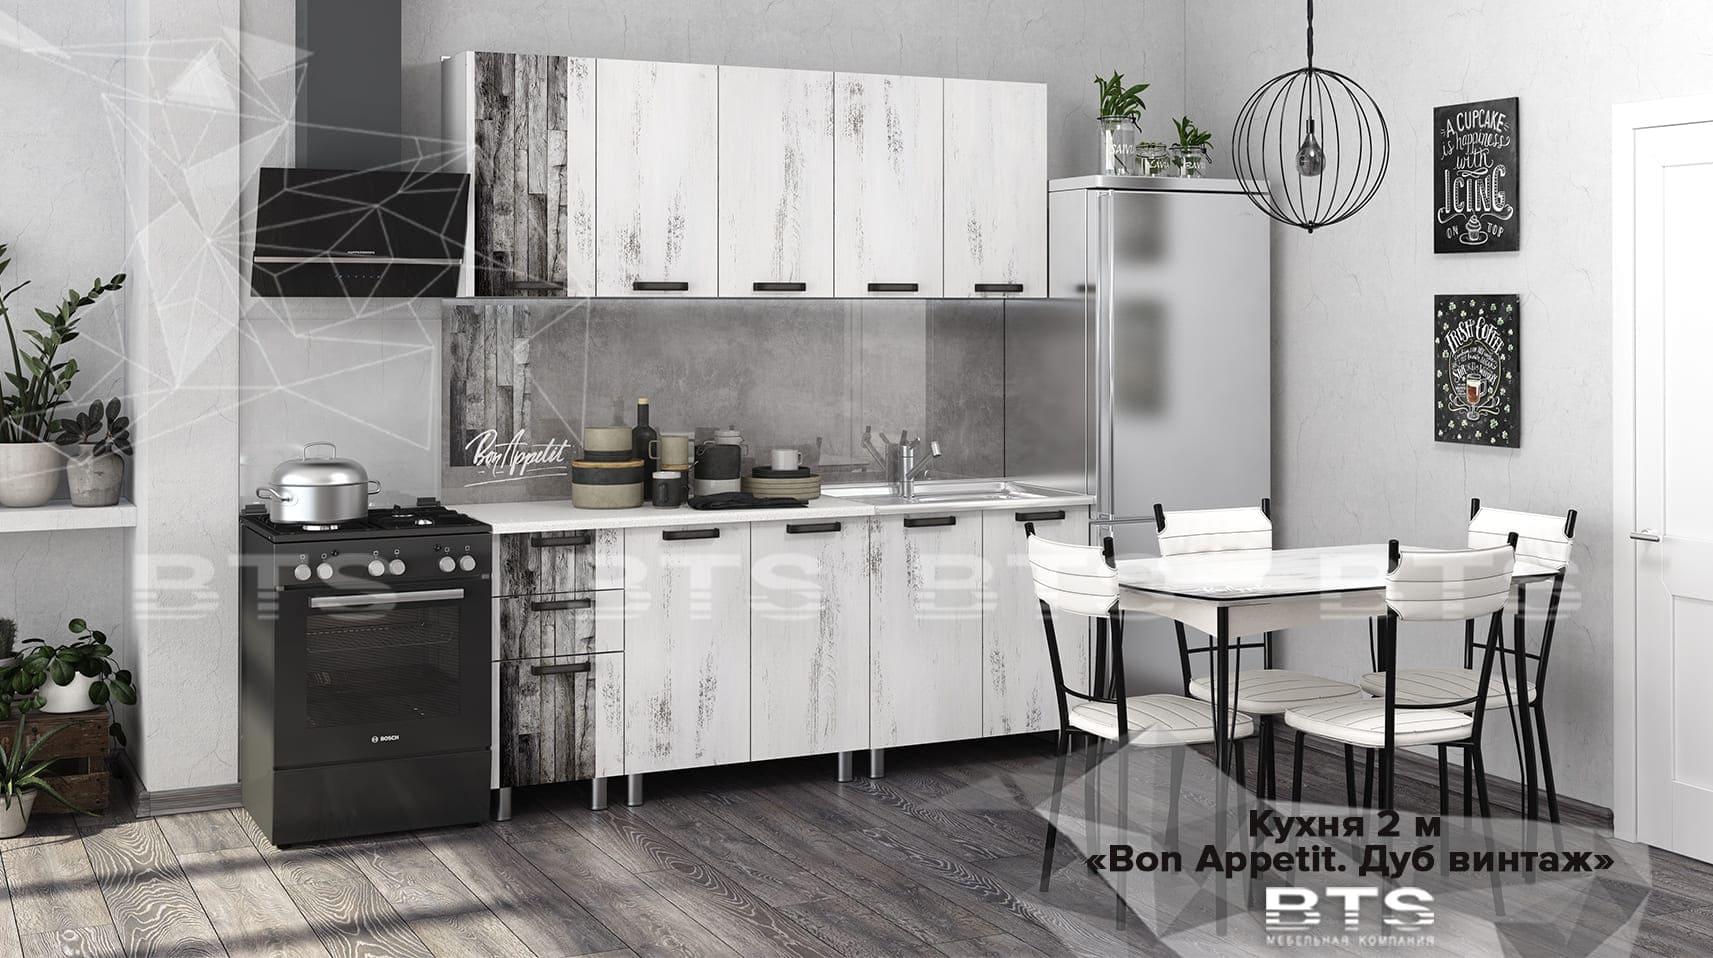 Кухня Bon Appetit 2 м — купить за 13753 руб. в Москве по цене производителя!